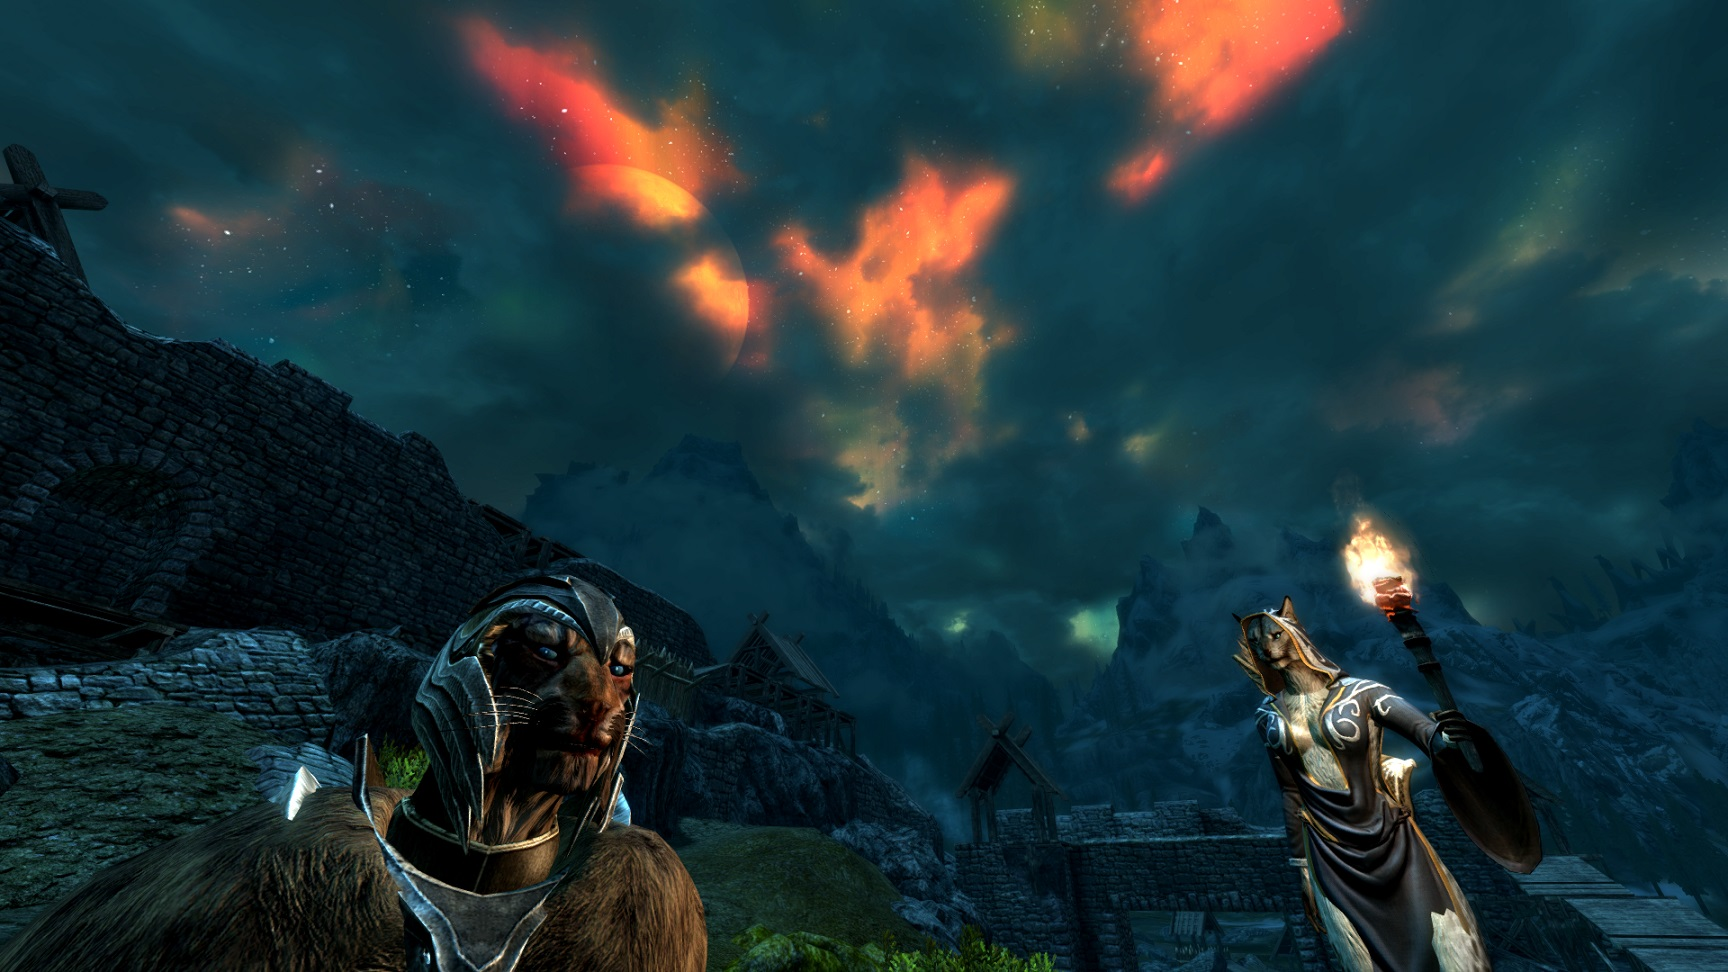 TESV 2014-01-02 03-42-28-66.jpg - Elder Scrolls 5: Skyrim, the